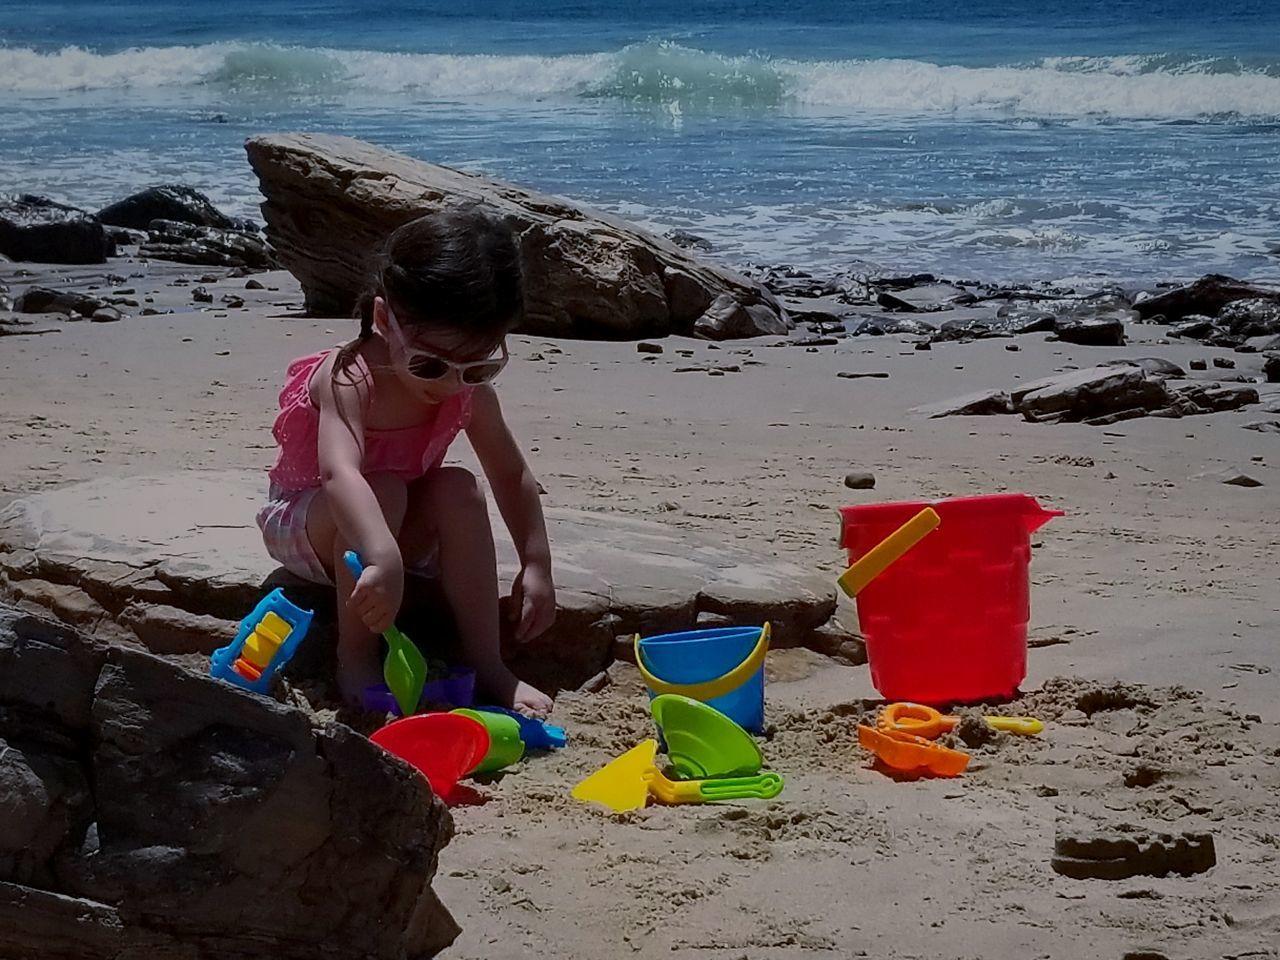 kids simple joy Beach Sand Sand Pail And Shovel Childhood Summer AndroidPhotography Travelphotography Fun In The Sun ☀ Heat Wave California Visitlaguna